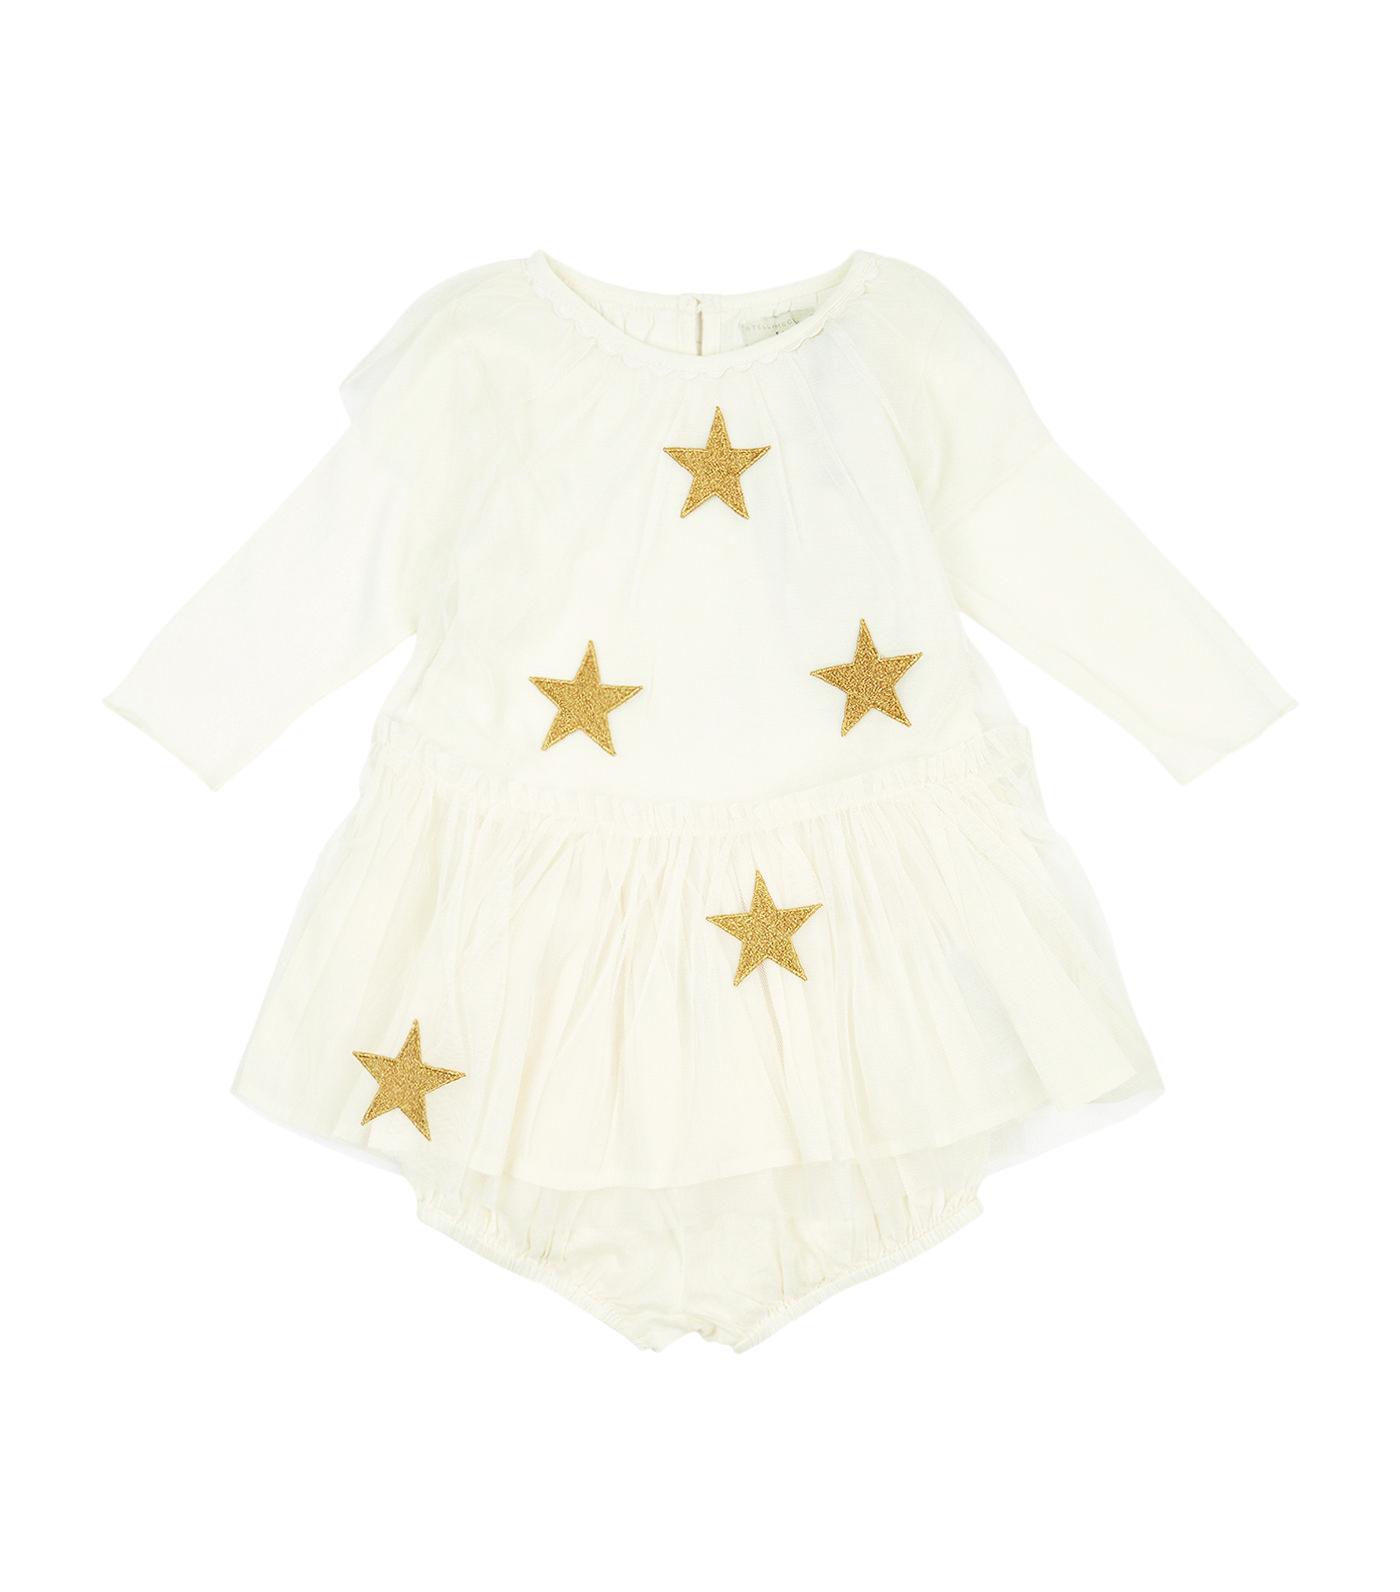 Baby London star products Stella McCartney star dress